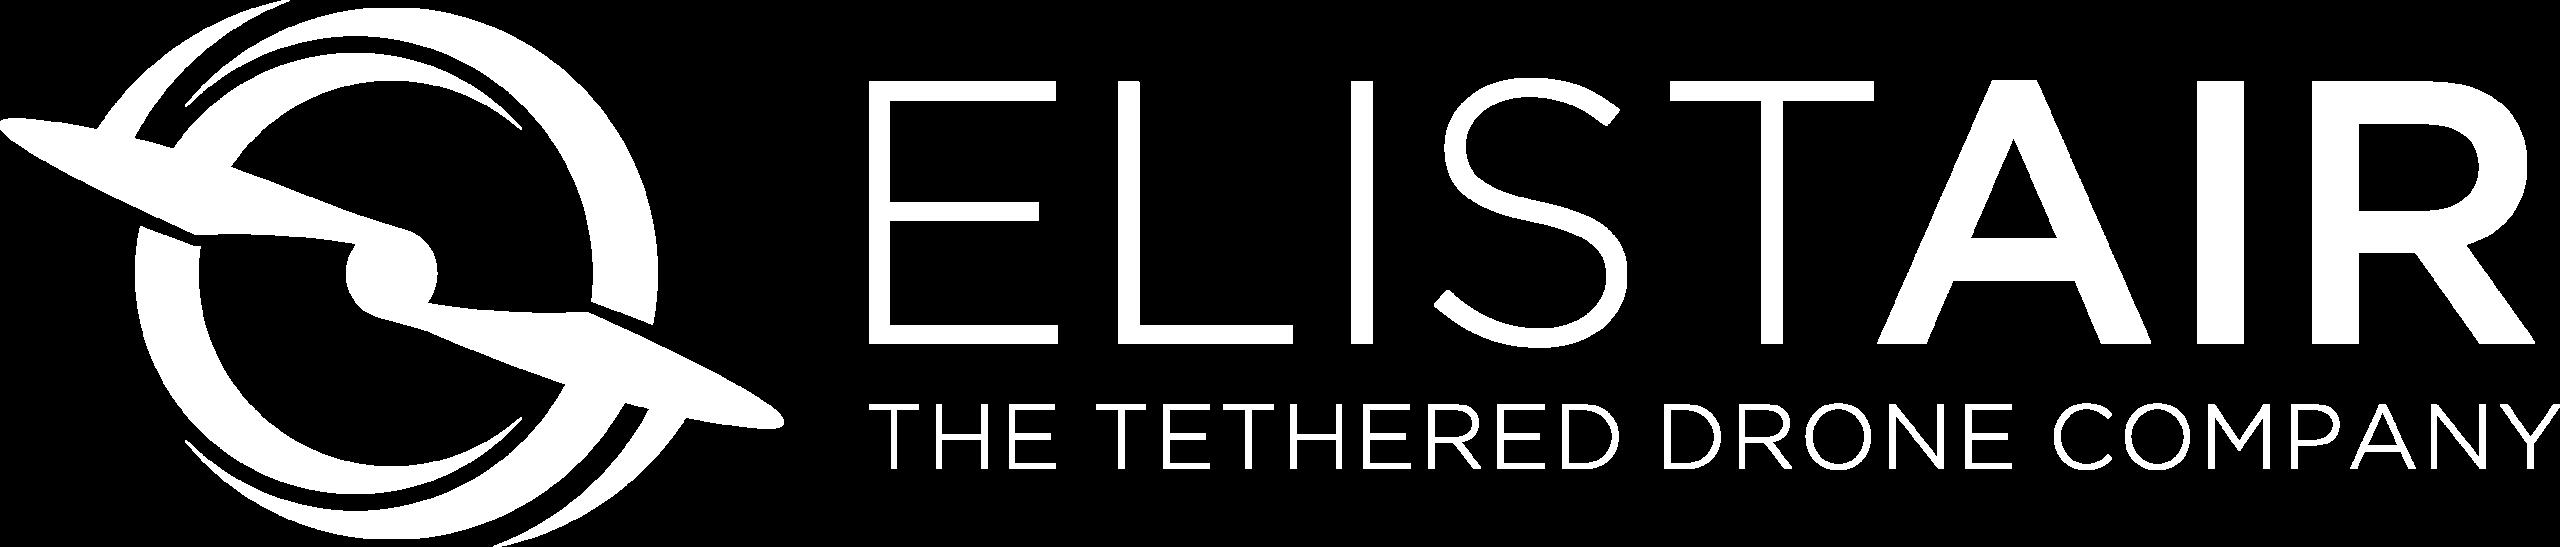 Logo white sur noir